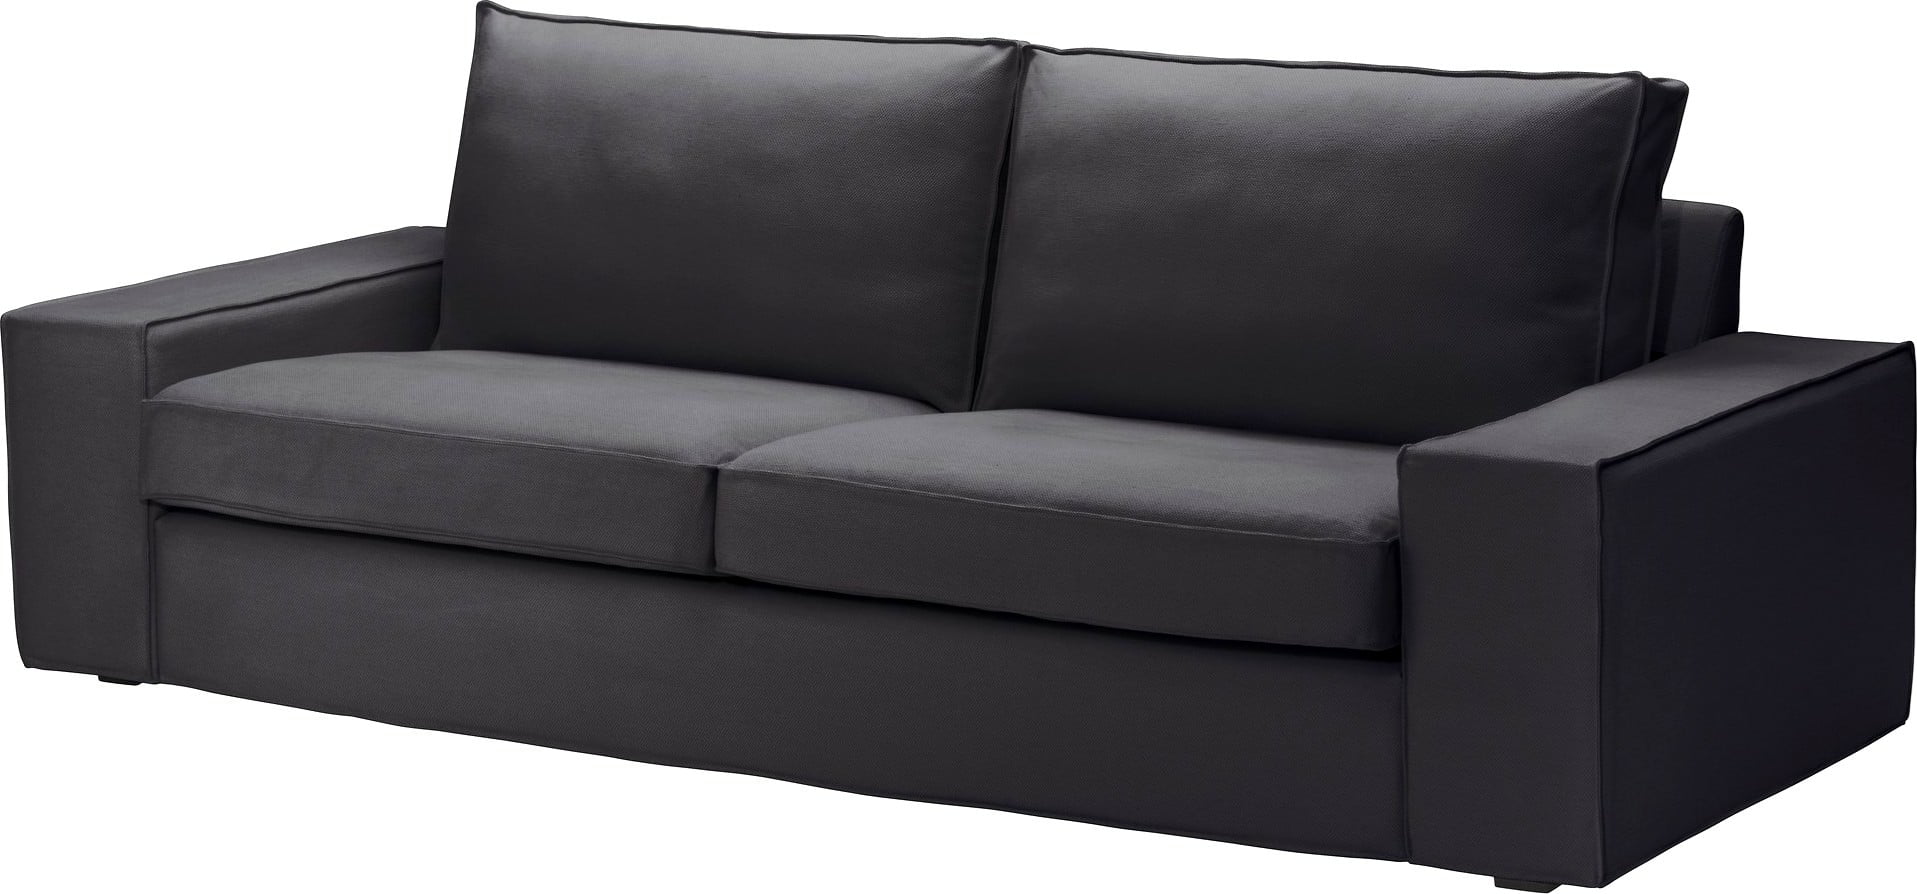 ikea-kanepe-modelleri İkea 2015 kanepe ve köşe koltuk modelleri